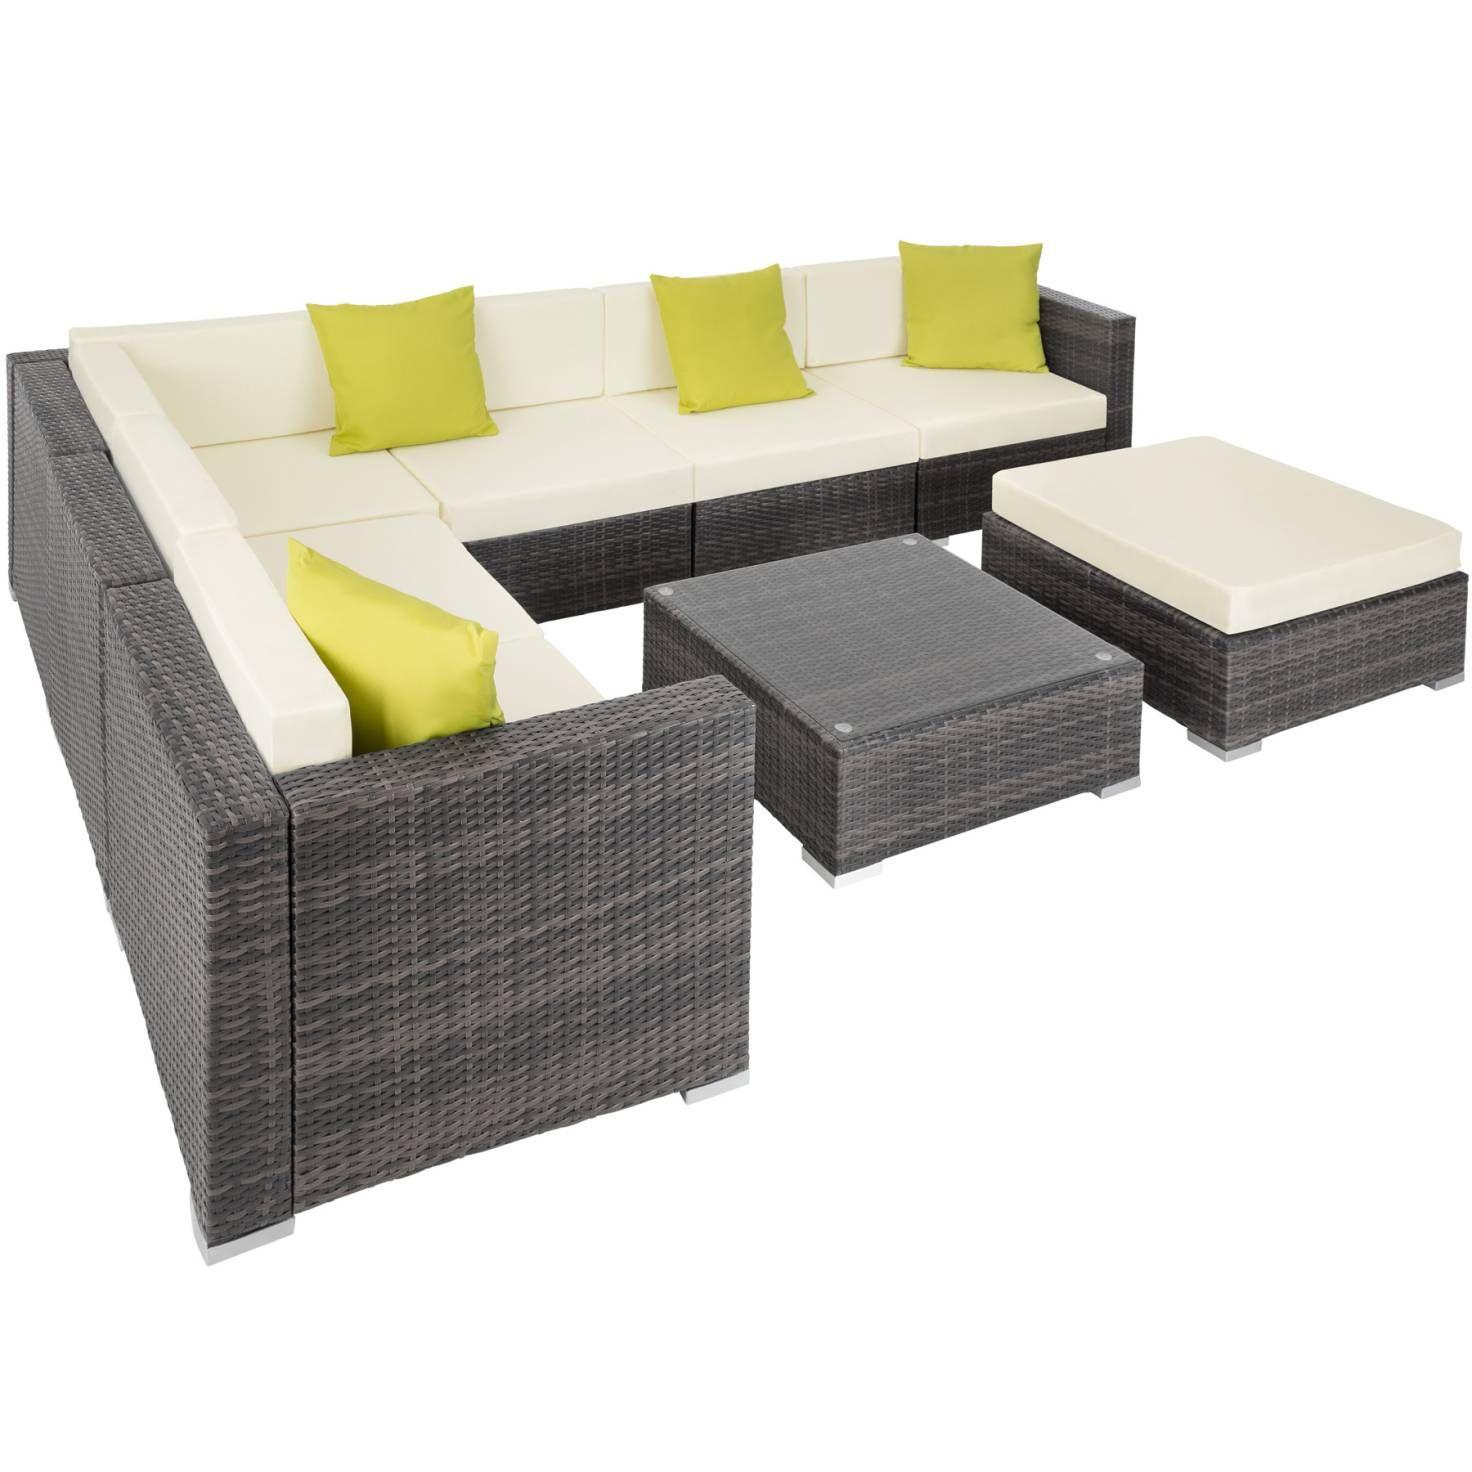 Rattan Lounge Mit Aluminiumgestell Marbella Gunstig Online Kaufen Tectake Rattan Gartenmobel Lounge Mobel Mobel Sofa